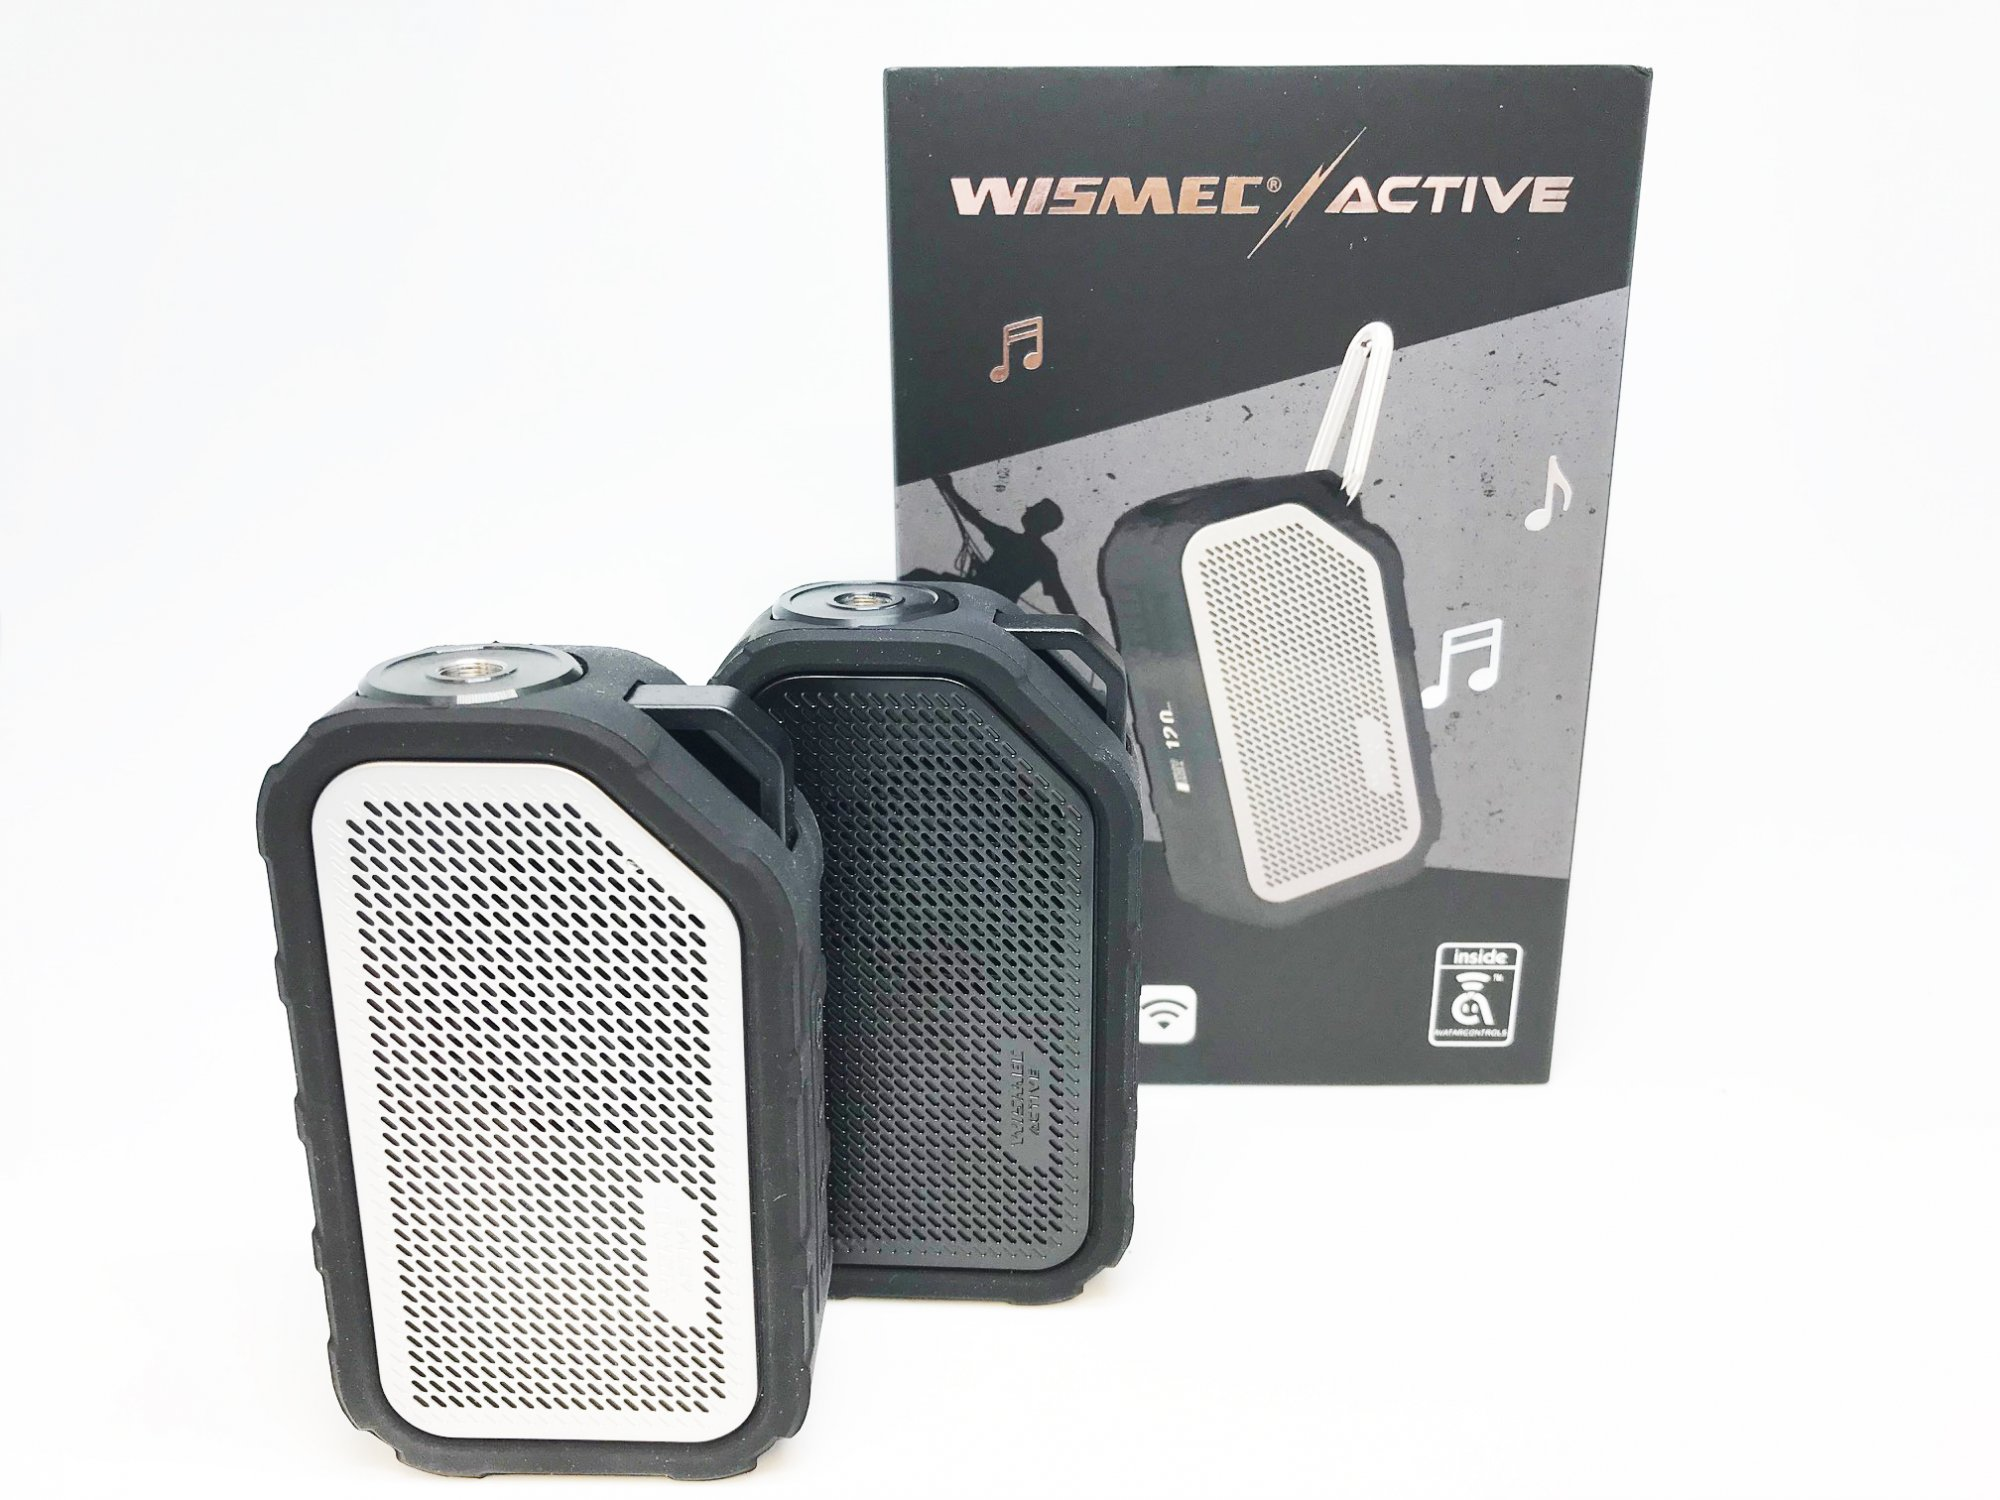 Wismec Active Mod